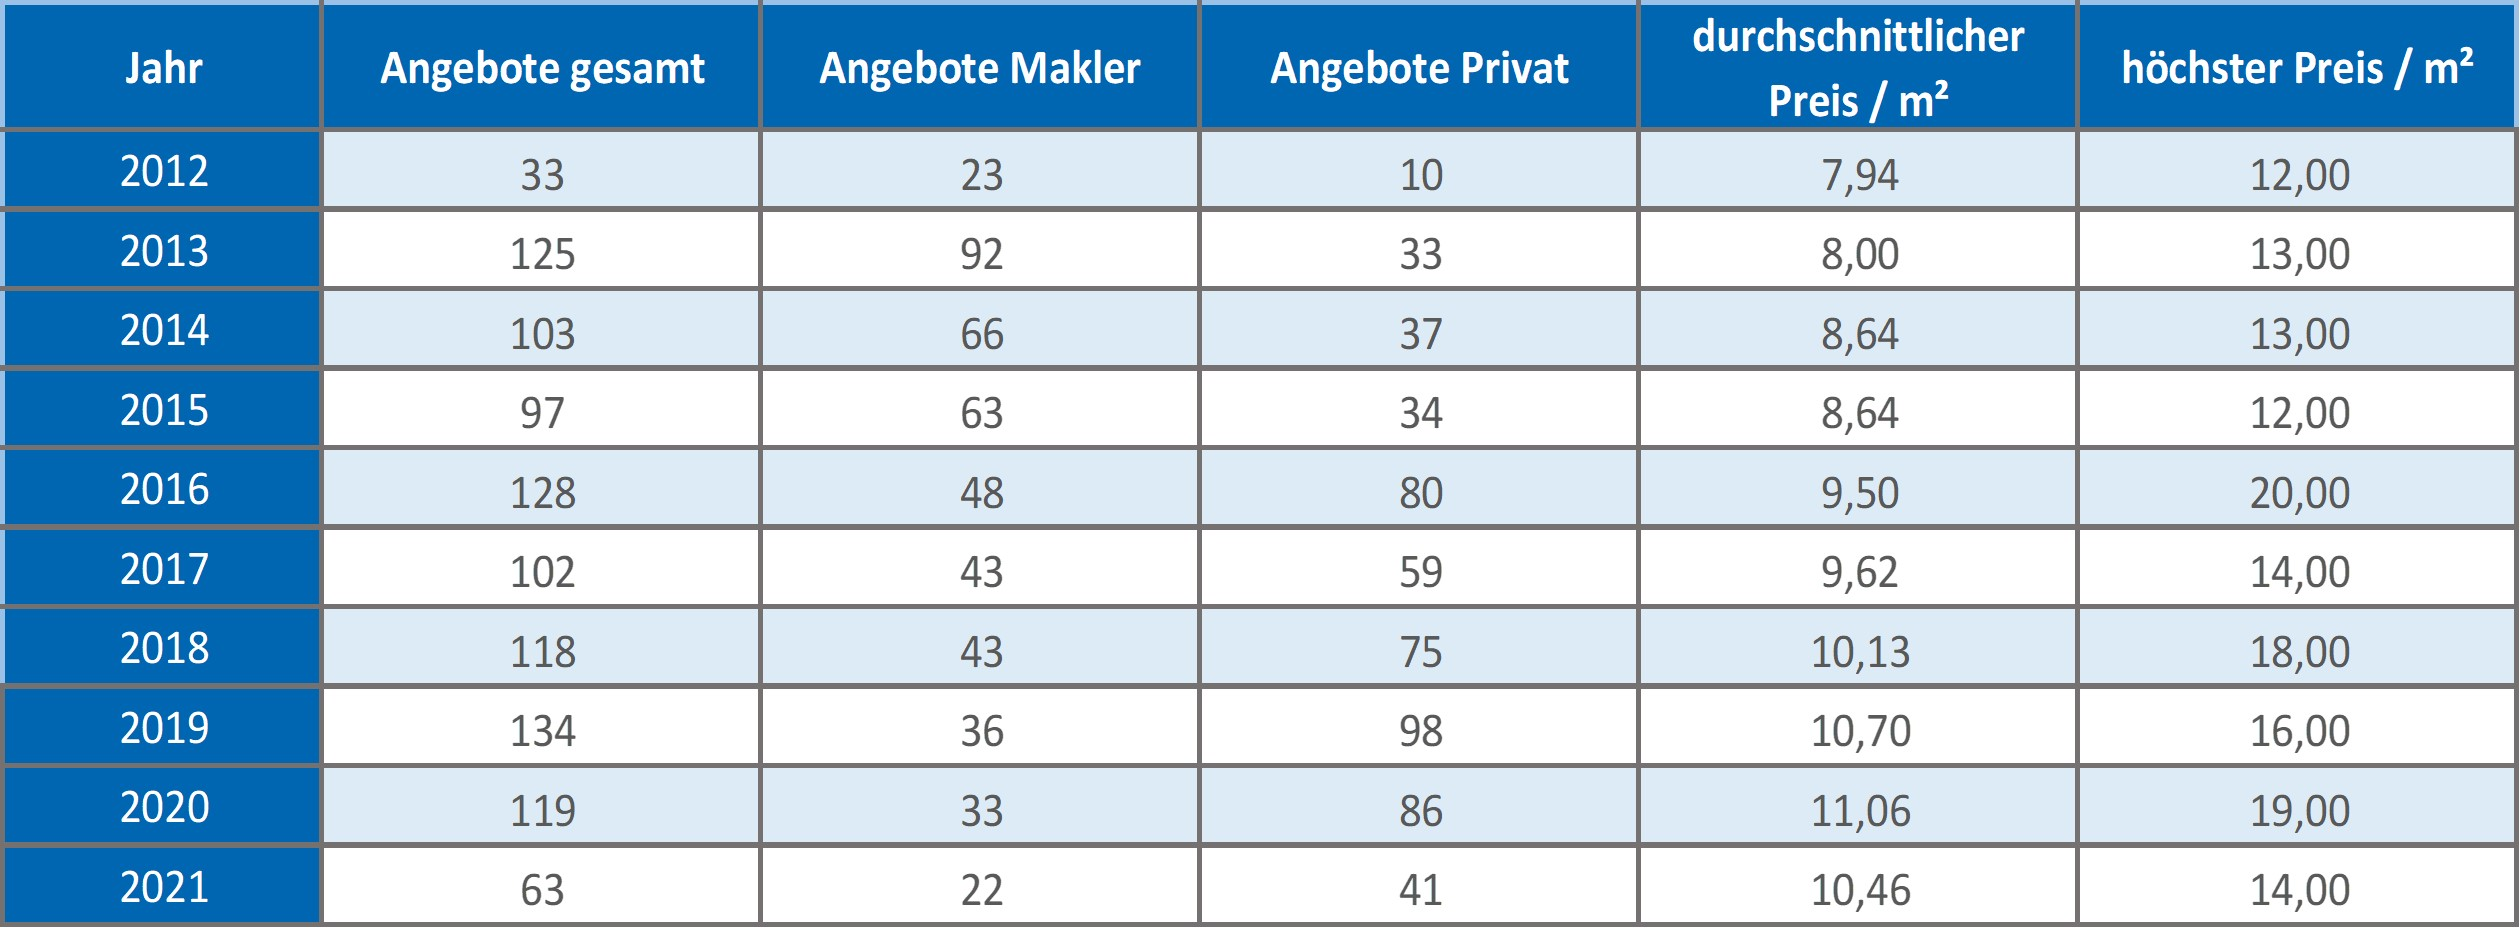 Feldkirchen-Westerham mieten vermieten Preis Bewertung Makler www.happy-immo.de 2019 2020 2021